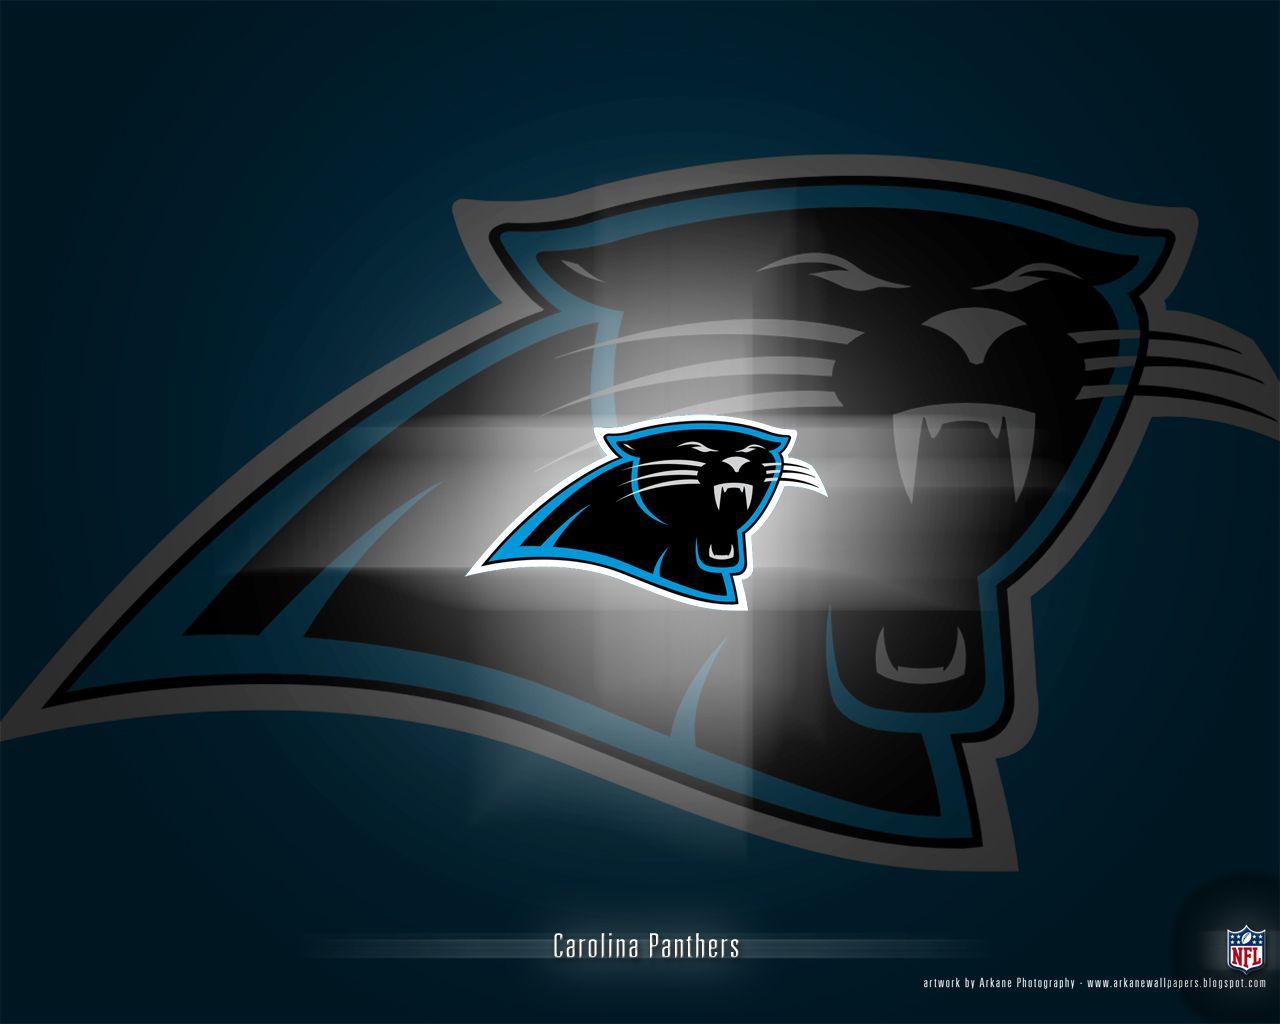 Arkane Nfl Wallpapers Carolina Panthers Vol 1 Carolina Panthers Carolina Panthers Wallpaper Carolina Panthers Football